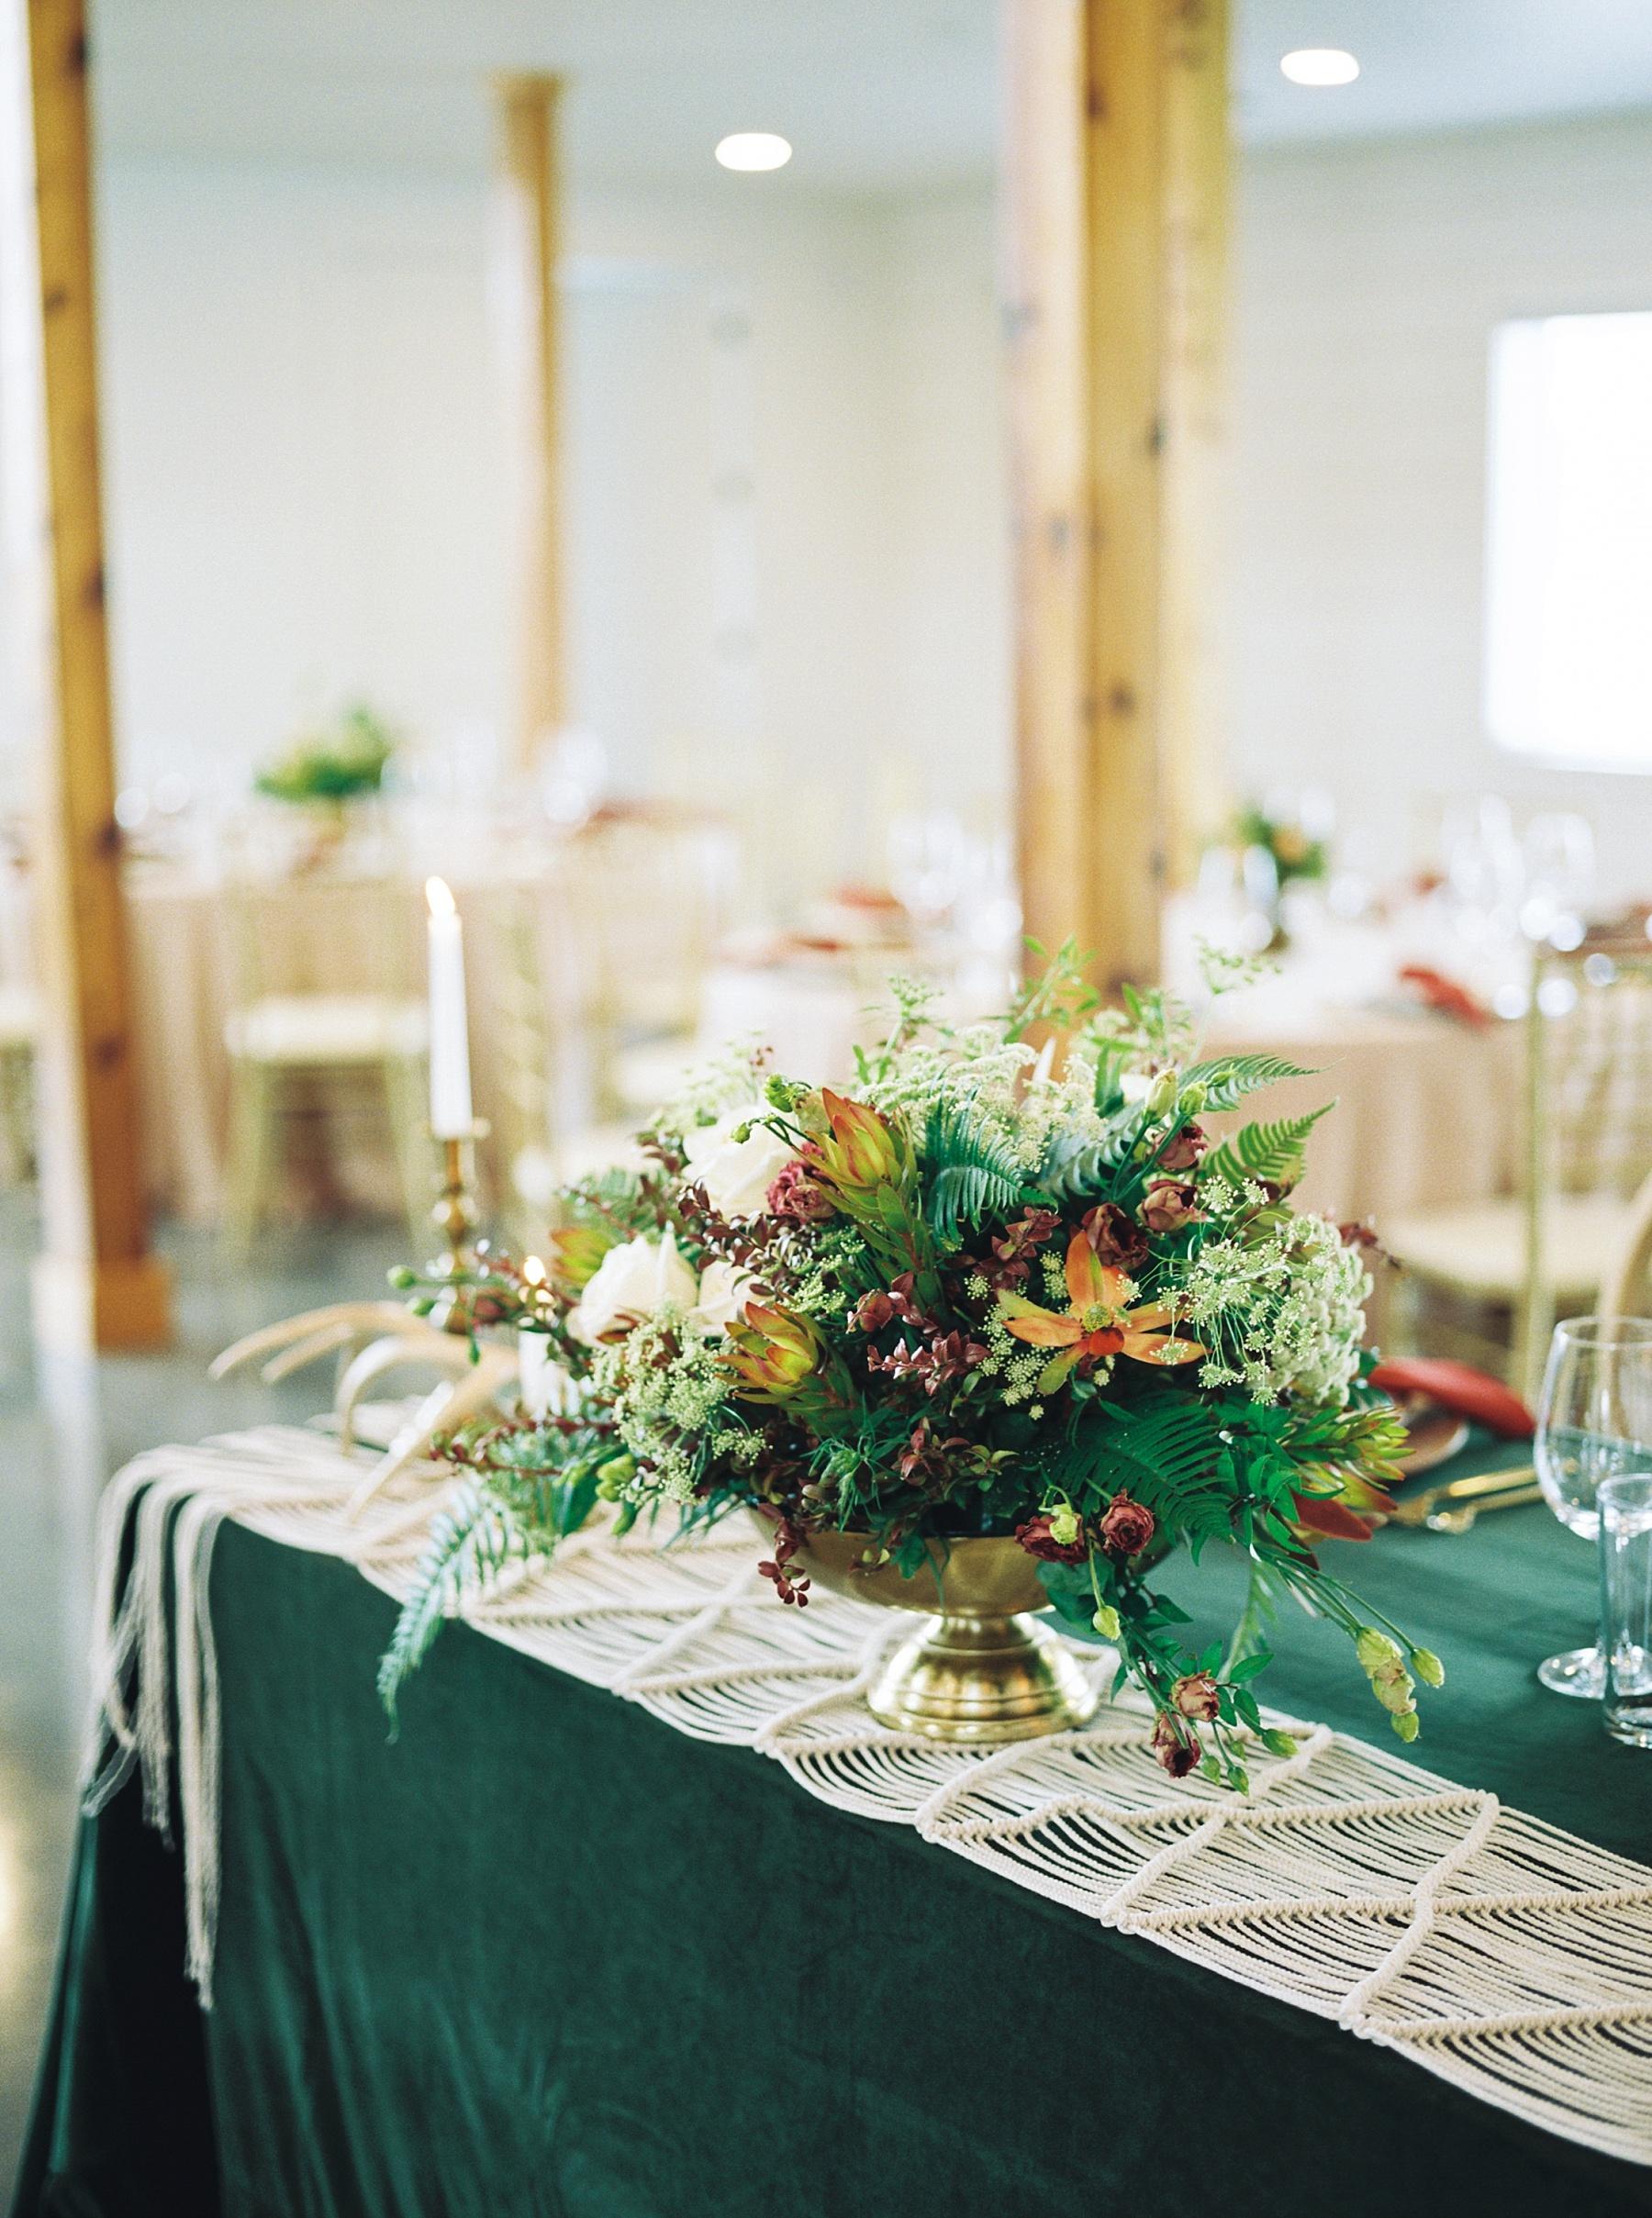 Eclectic Scandinavian Winter Wedding in All White Venue Emerson Fields by Kelsi Kliethermes Photography Best Missouri and Maui Wedding Photographer_0049.jpg